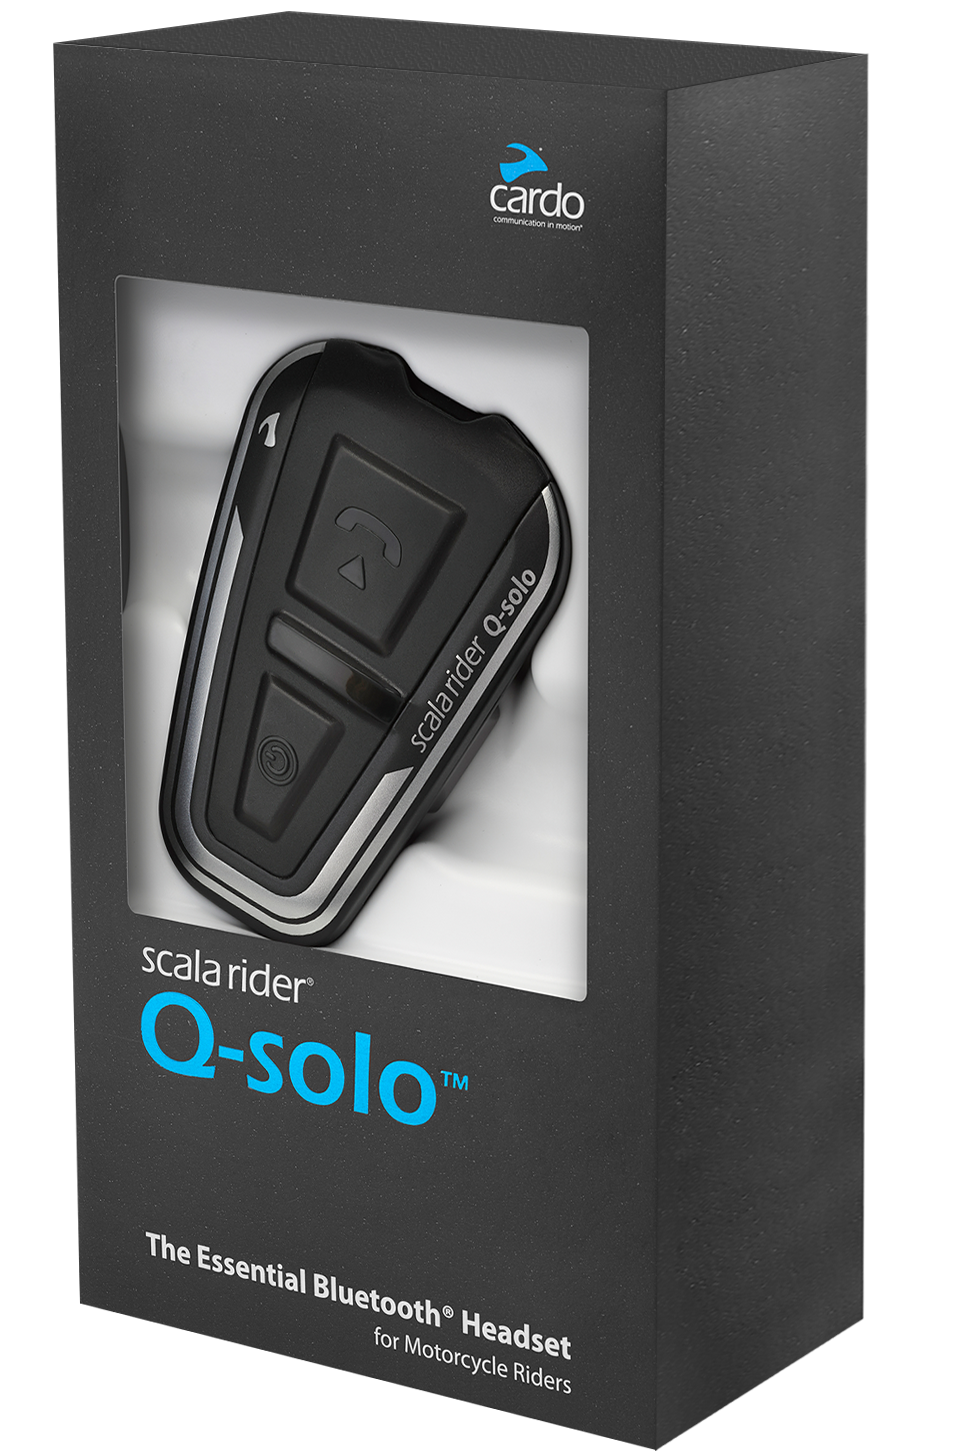 Q-Solo (bluetooth headset) — Cardo Systems